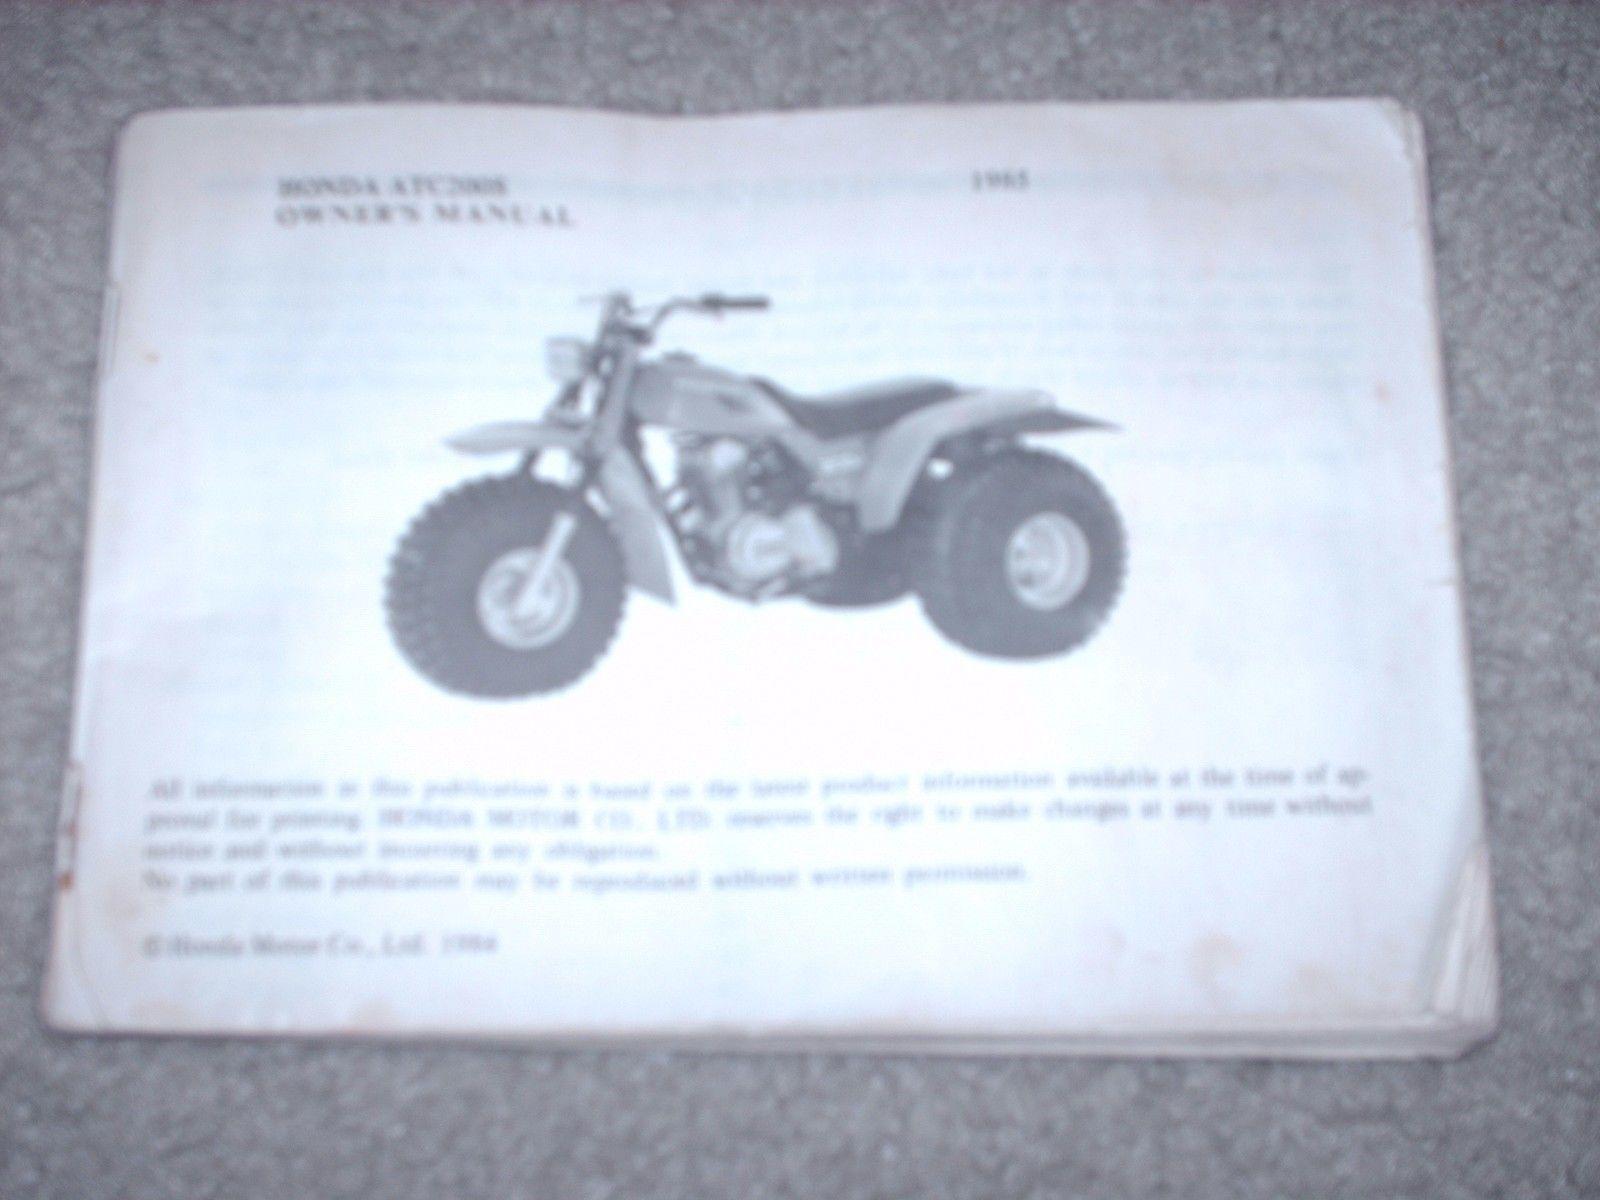 Honda 200s Wiring Diagram Yamaha Xj650 Kawasaki Ksf 250 1985 Atv Model Atc Owners Manual And Similar Items On